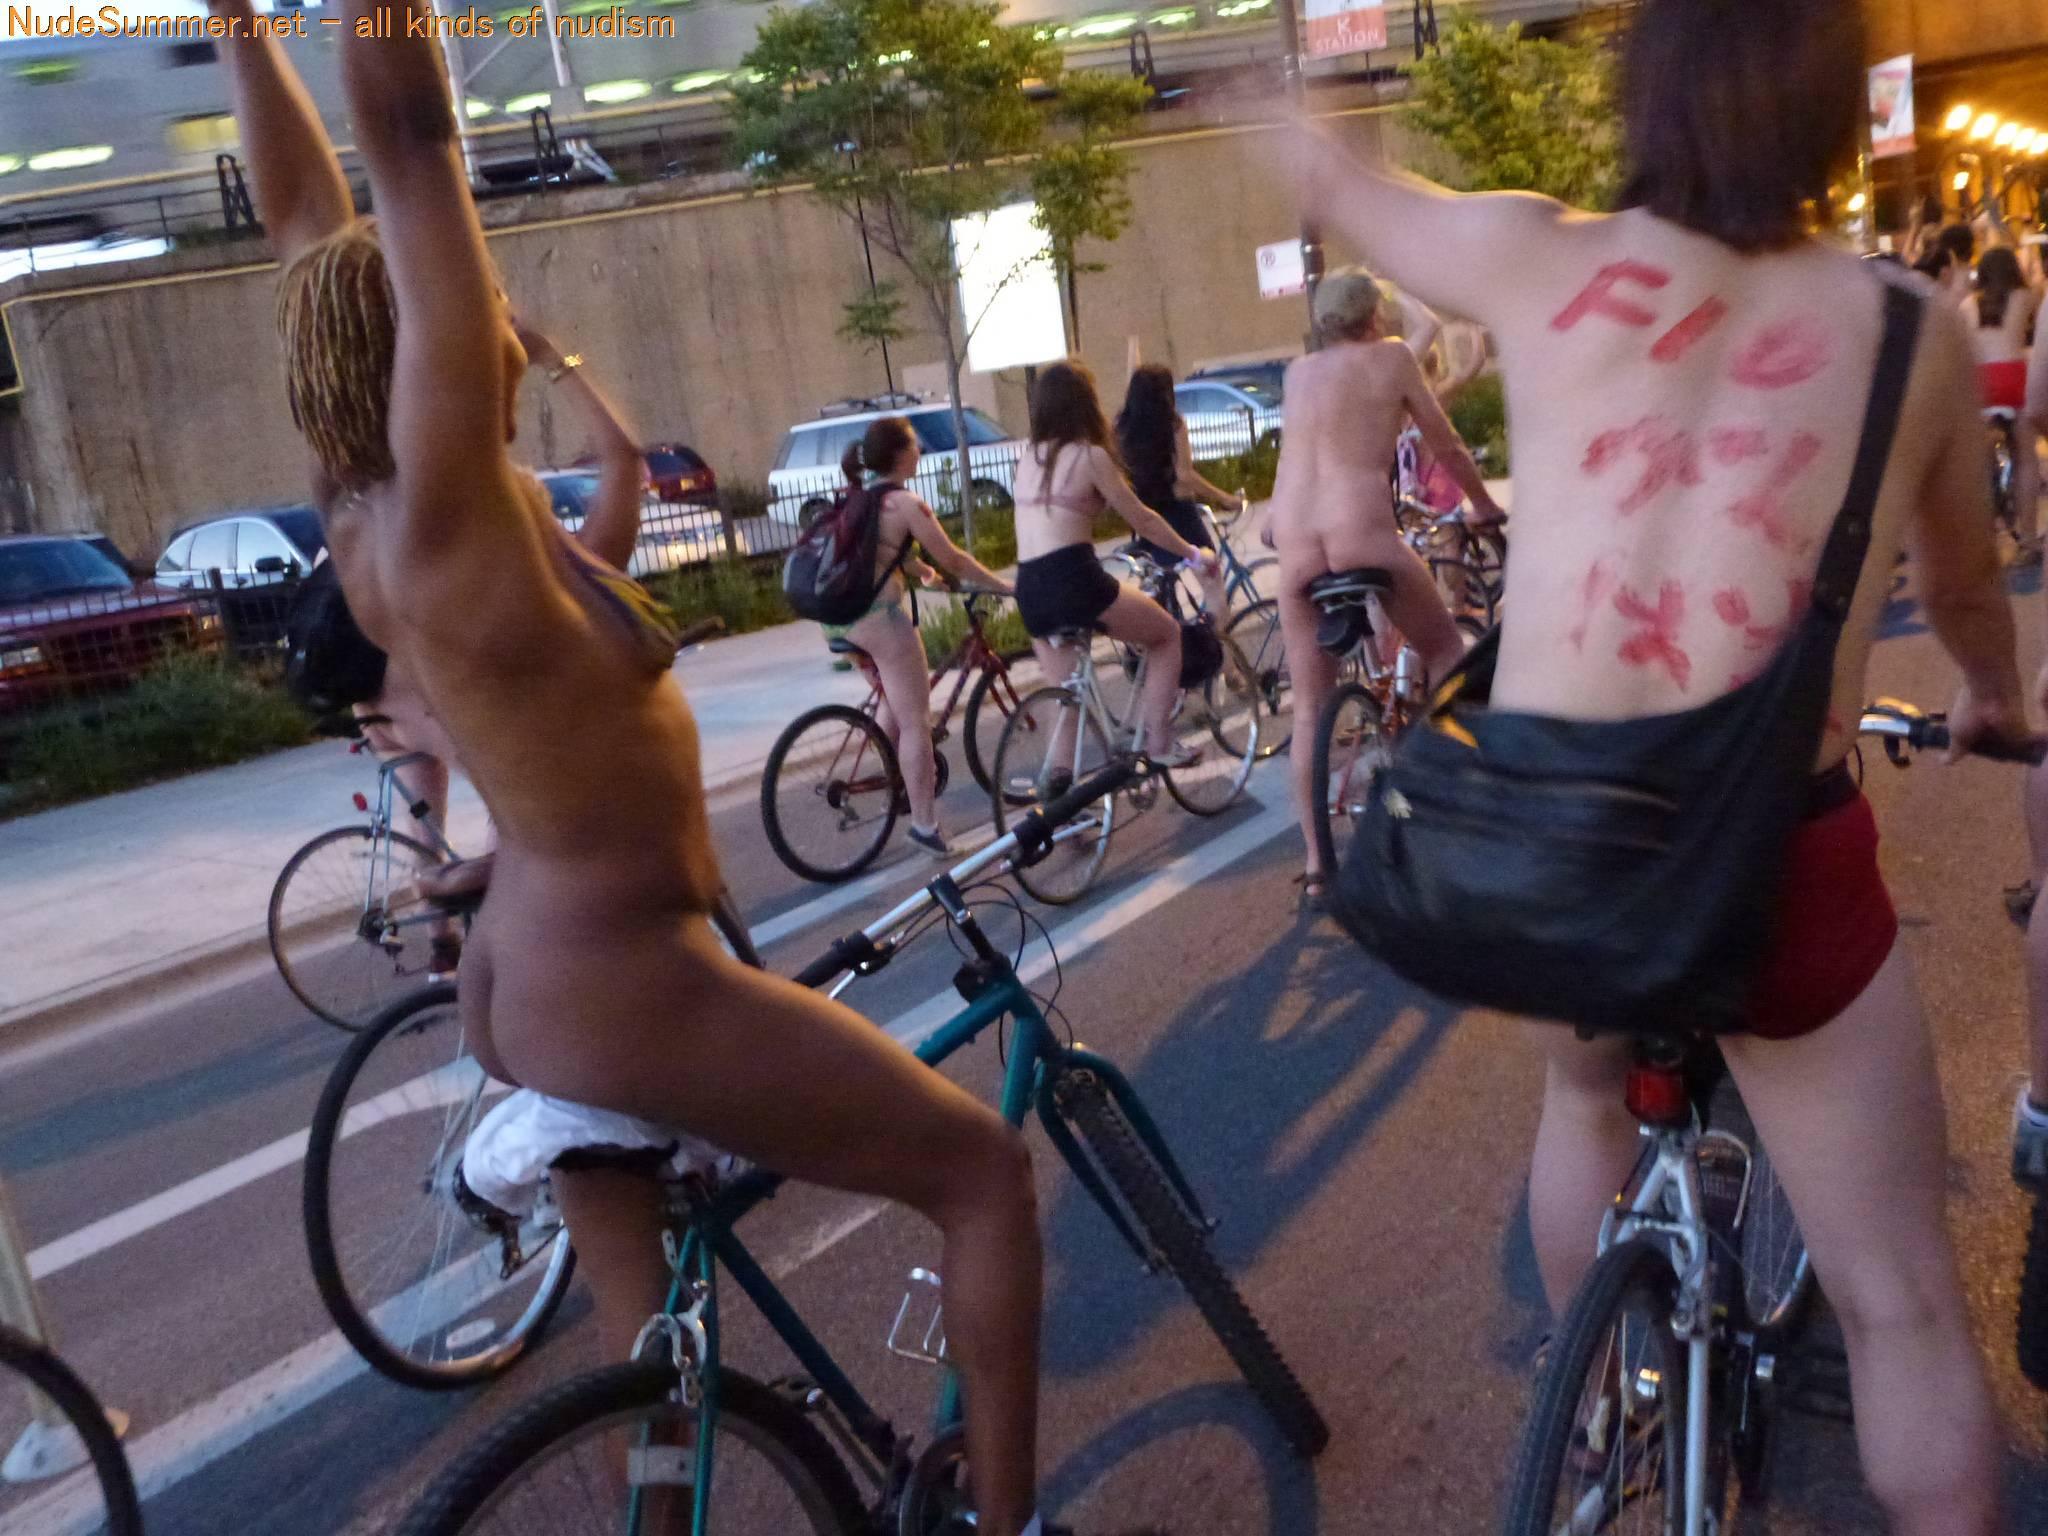 Nudist Photos World Naked Bike Ride (WNBR) 2012 Part 1 - 2